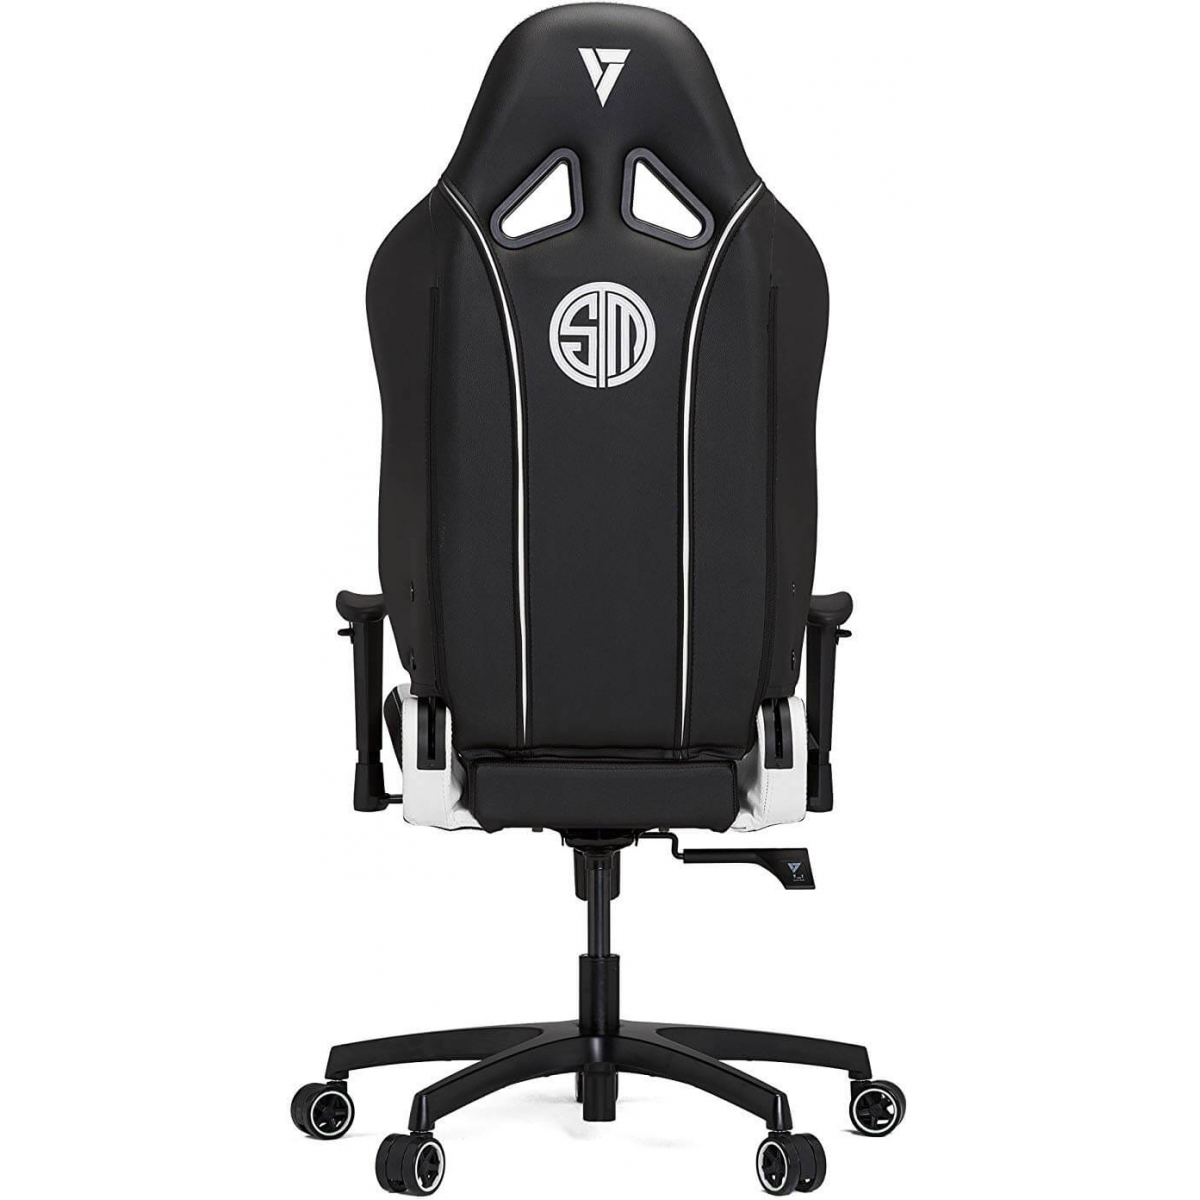 Cadeira Gamer Vertagear Racing SL2000 TSM Edition, Black-White, VG-SL2000_TSM